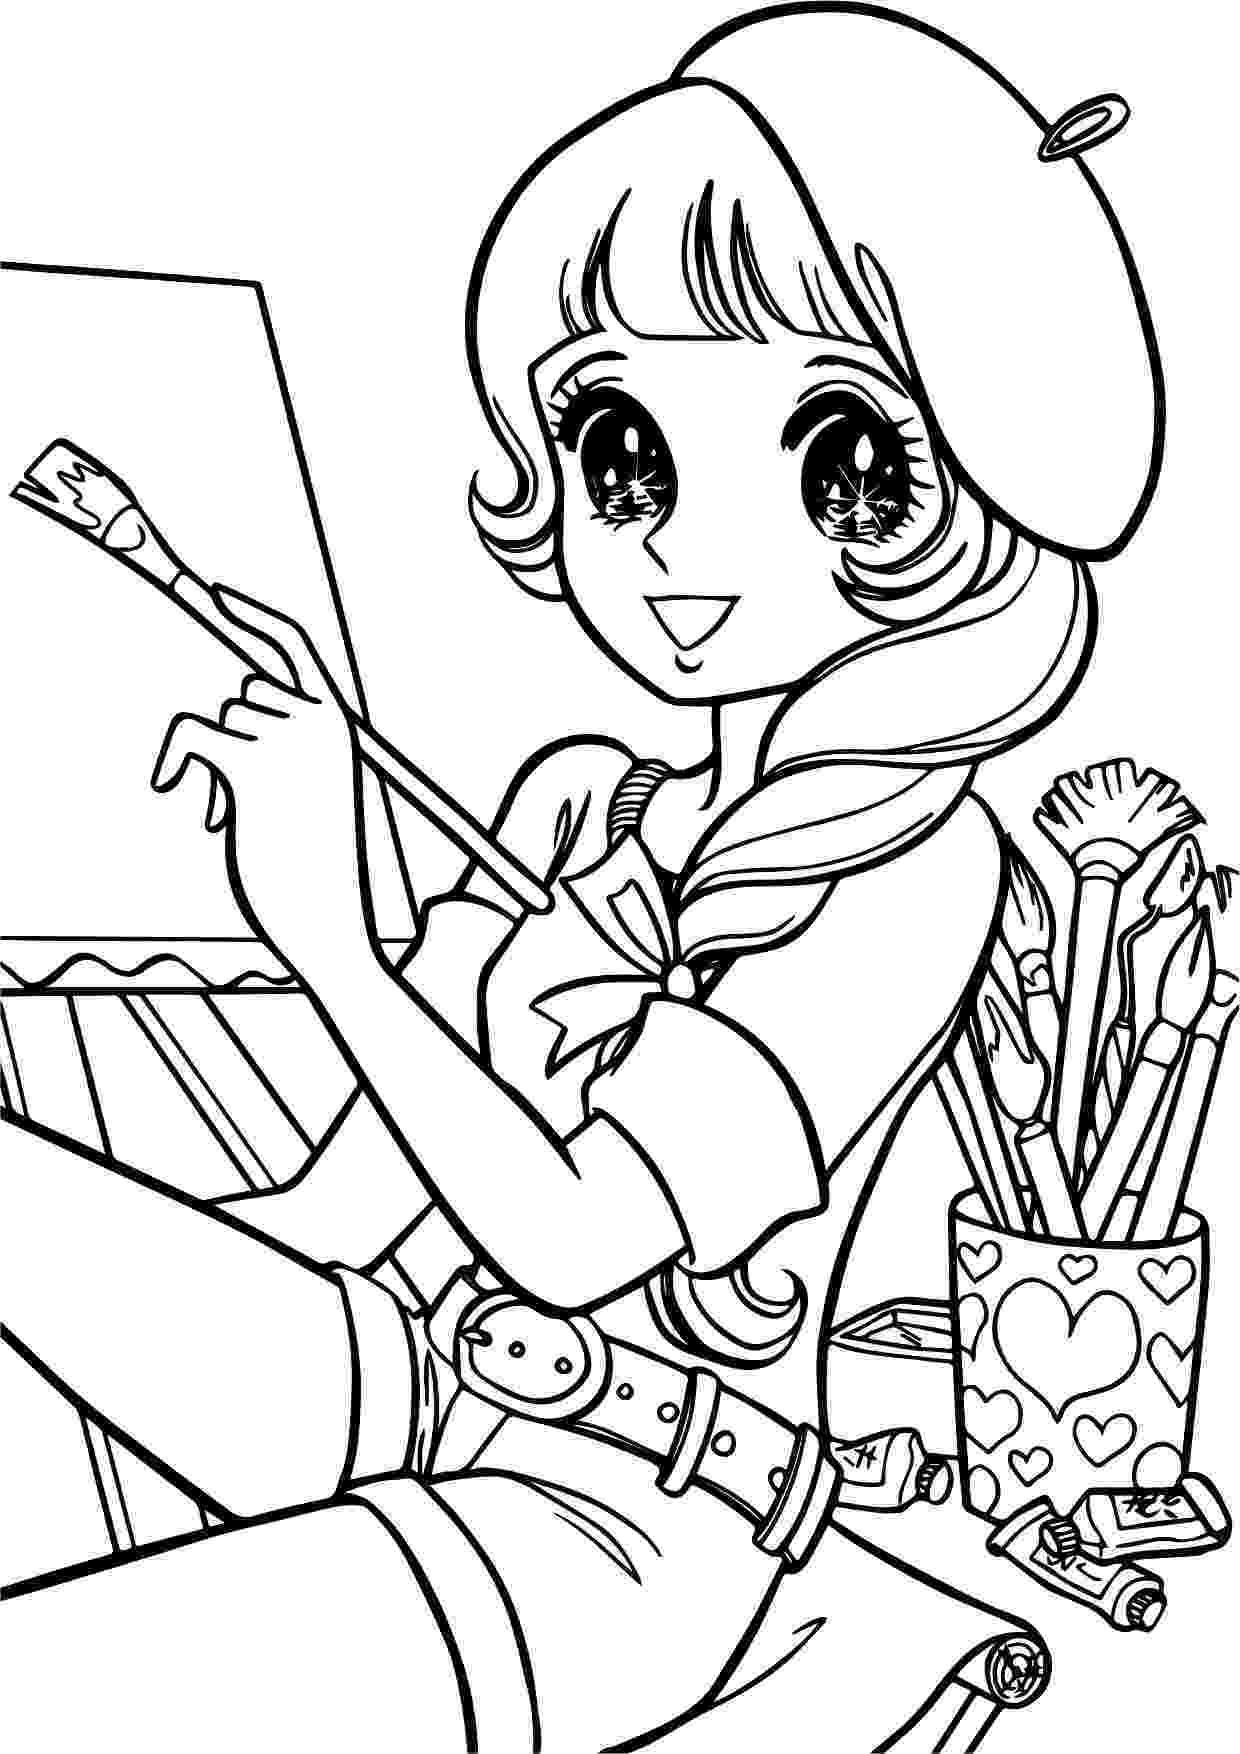 coloring pages girl aeromachia shojo manga no memory painter girl coloring pages girl coloring